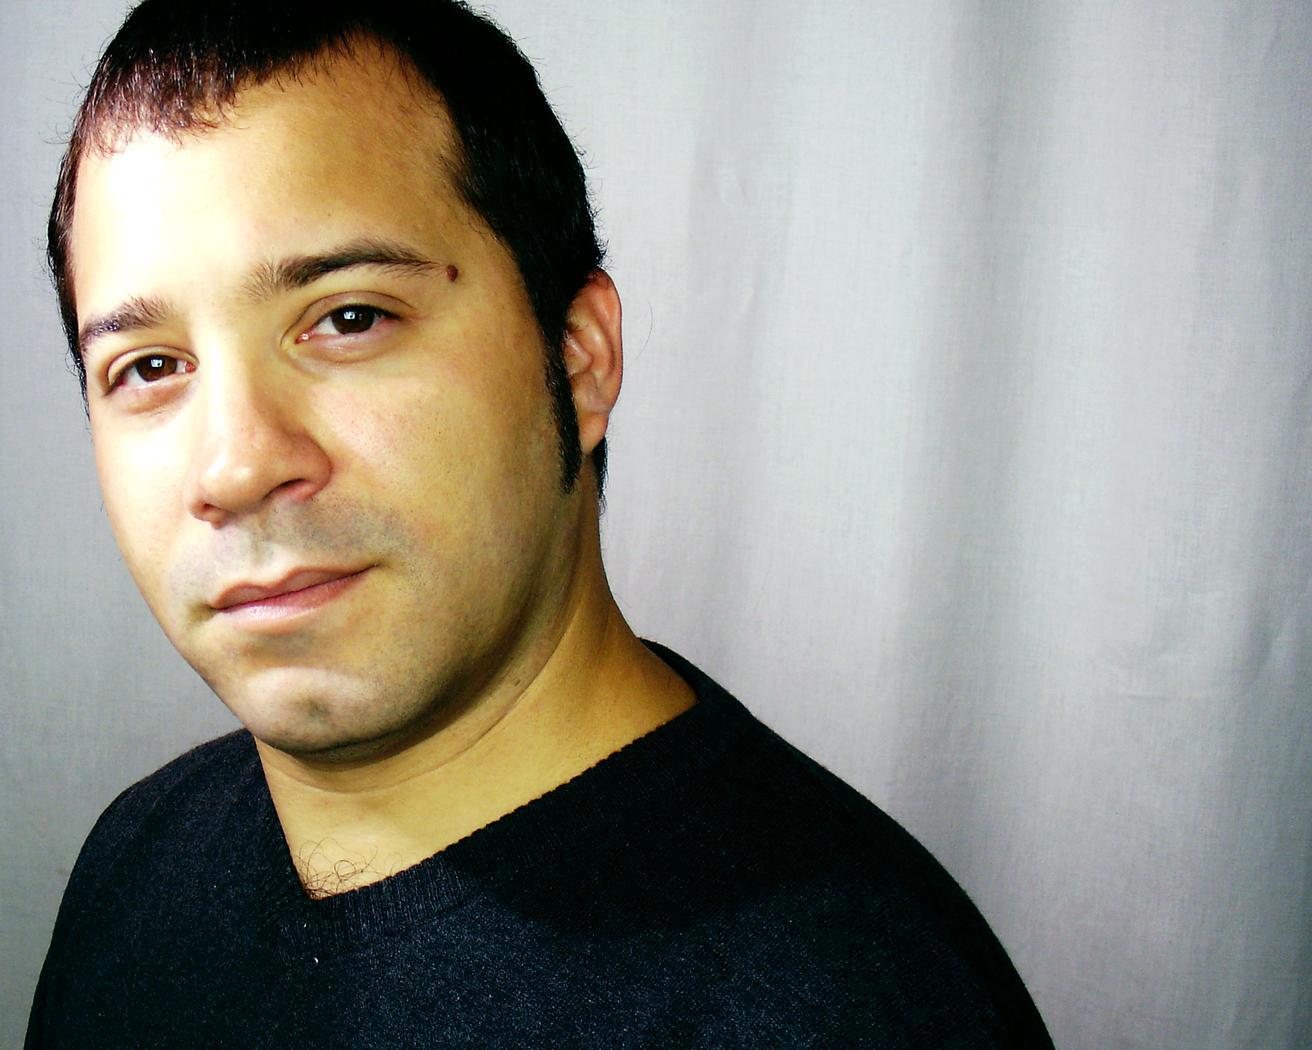 Michael J. Carrasquillo